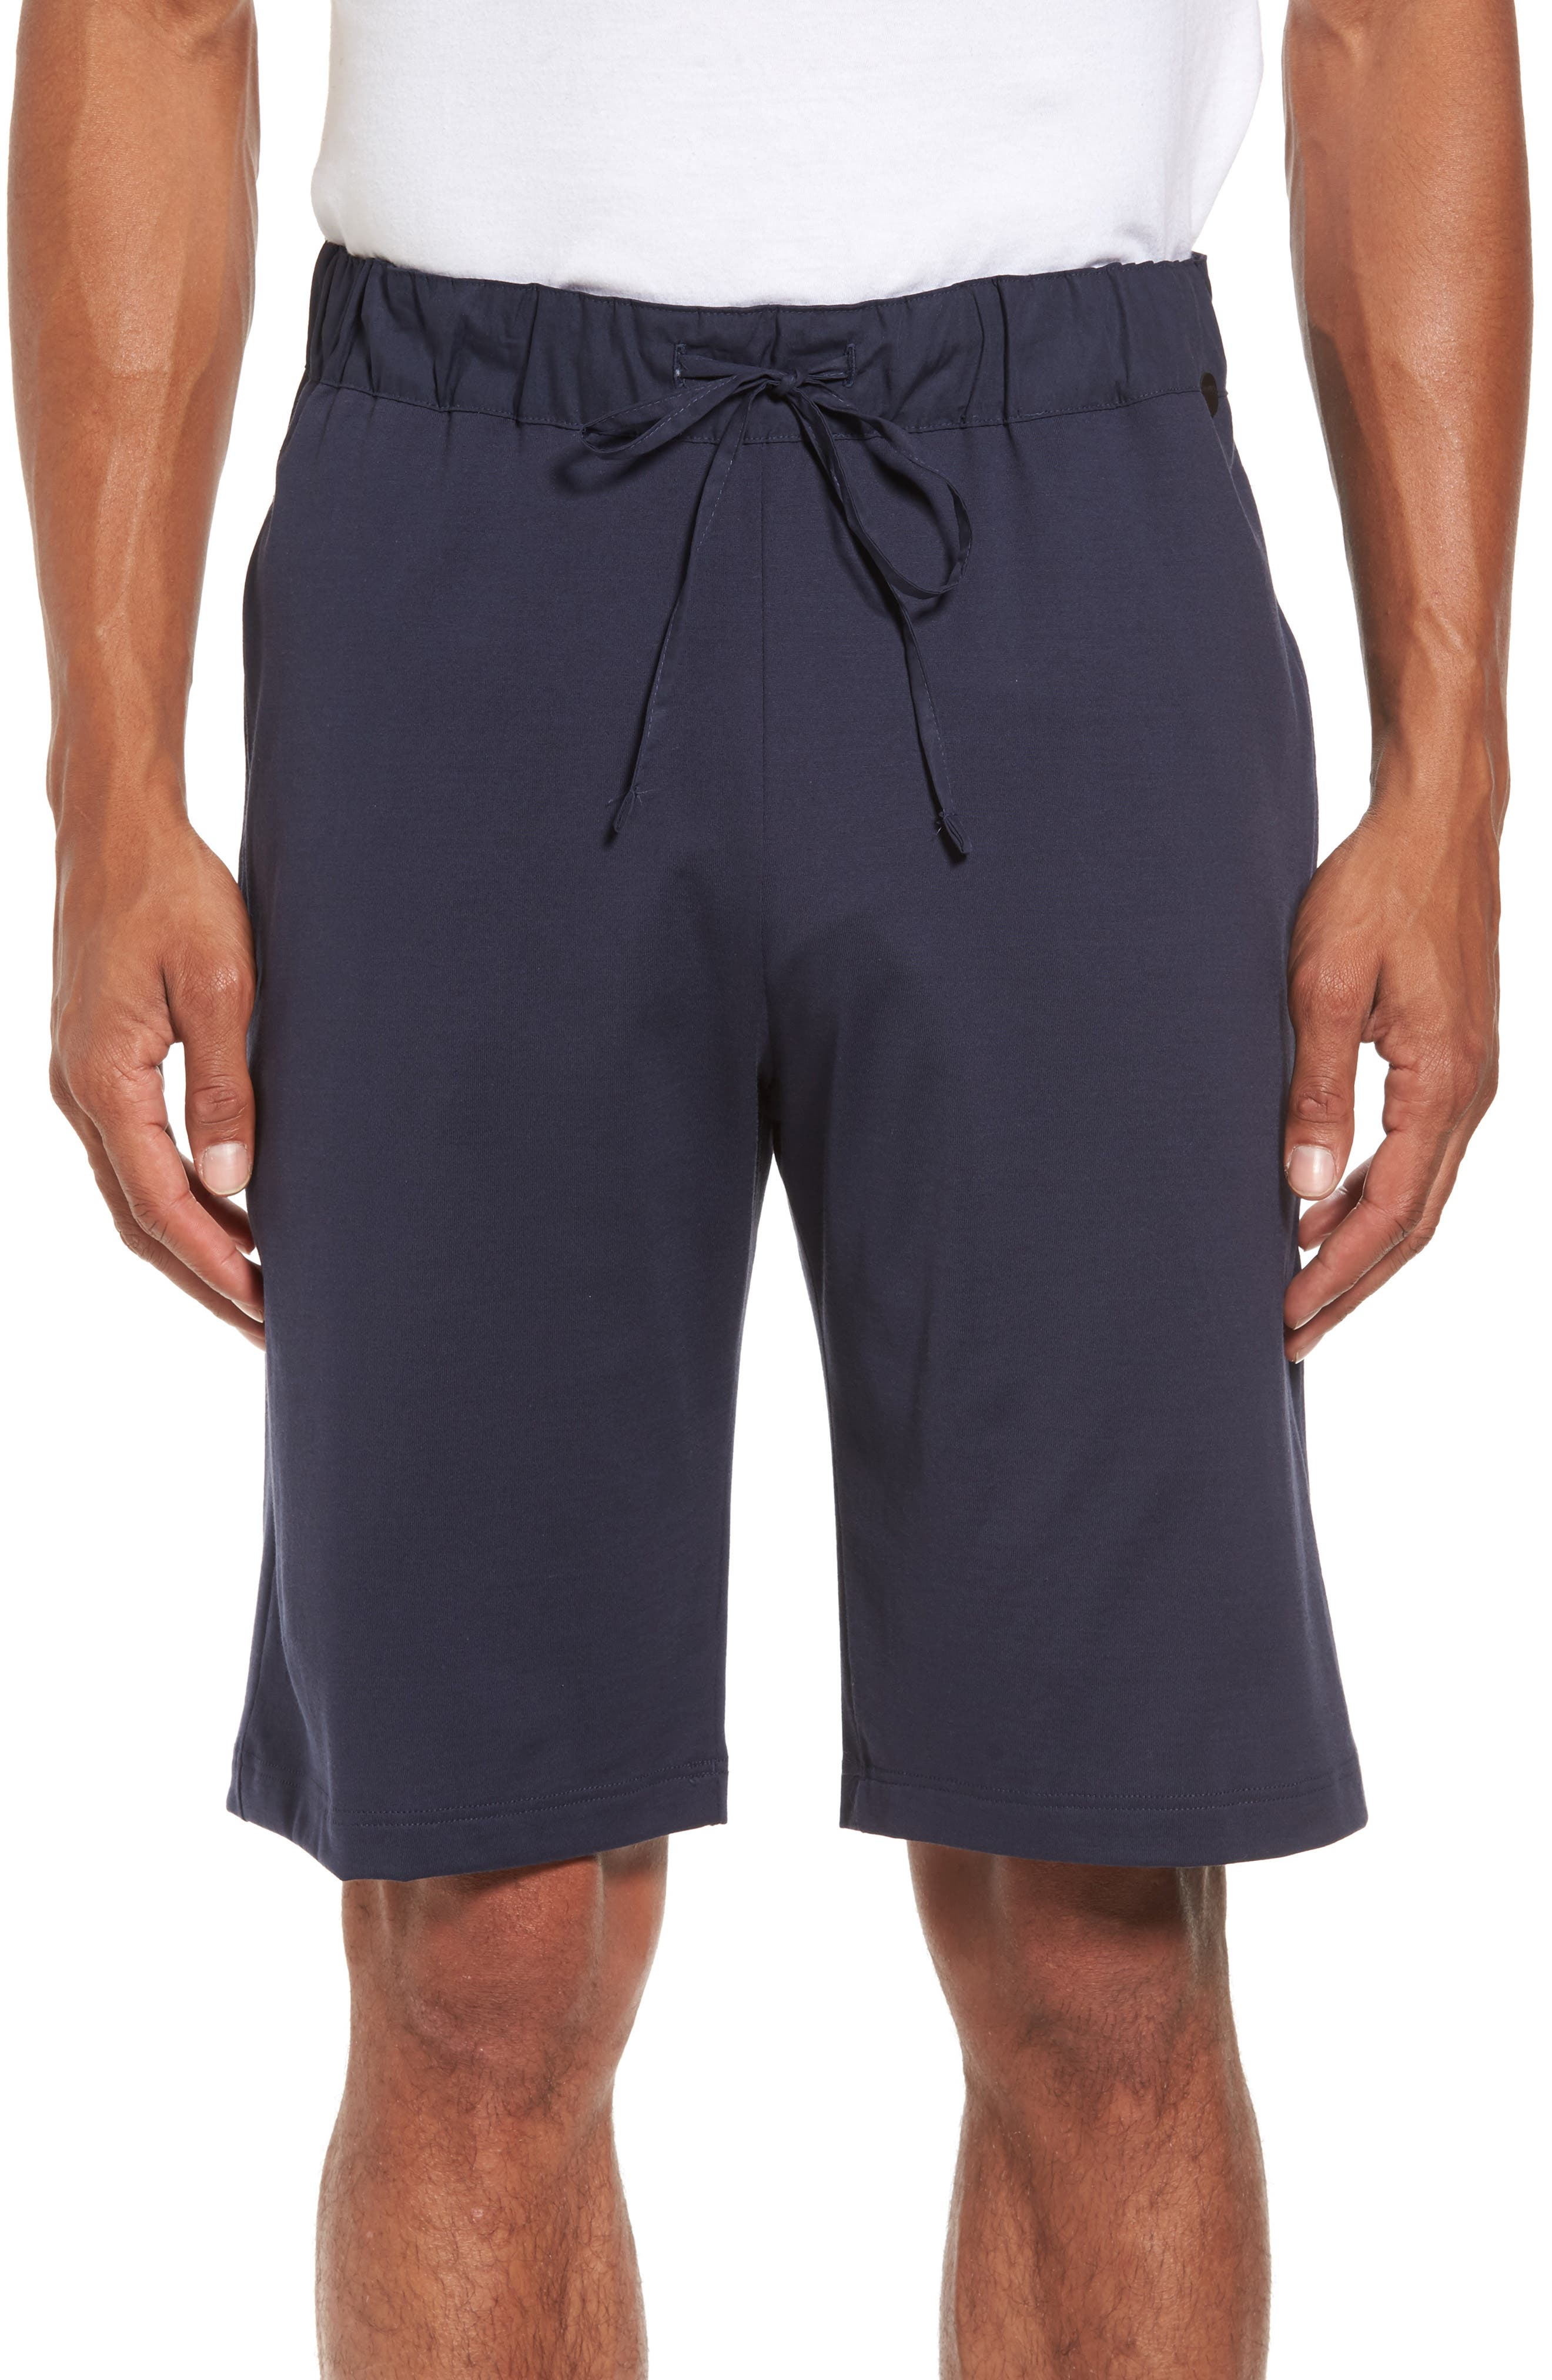 Night & Day Knit Shorts,                         Main,                         color, BLACK IRIS